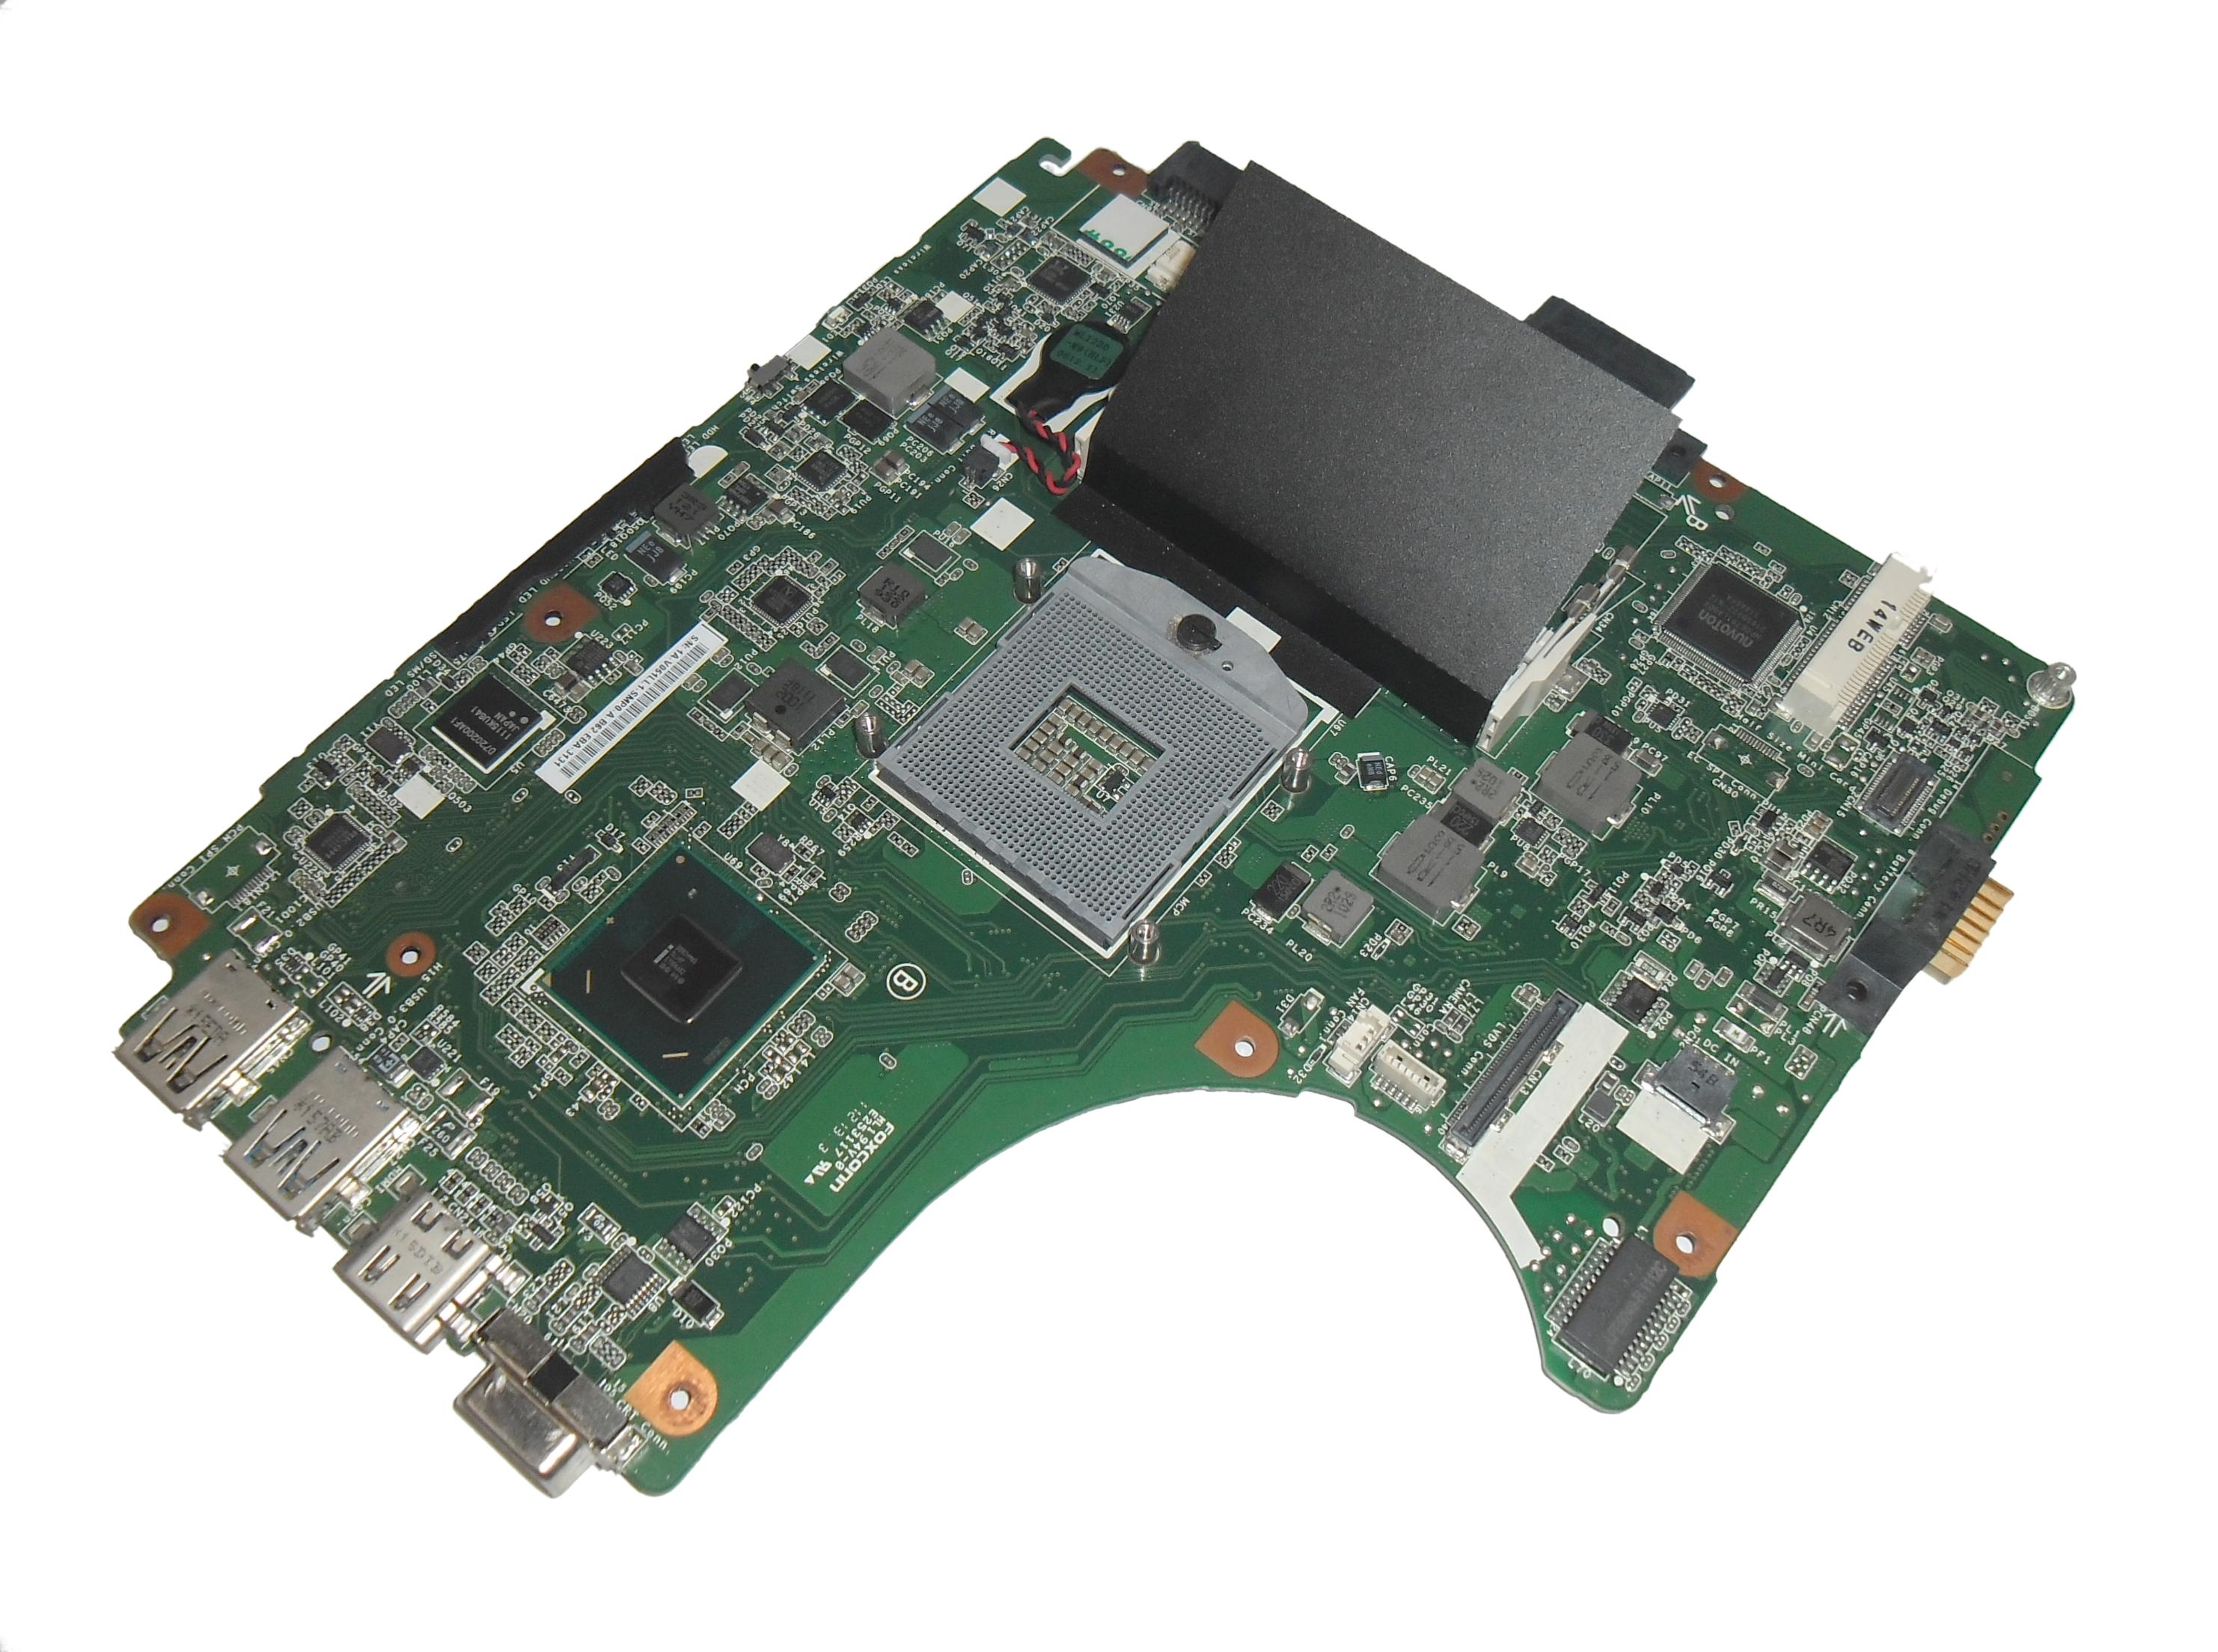 A1830929 Sony Vaio VPCCA Socket rPGA-988B Notebook Motherboard - MBX-241